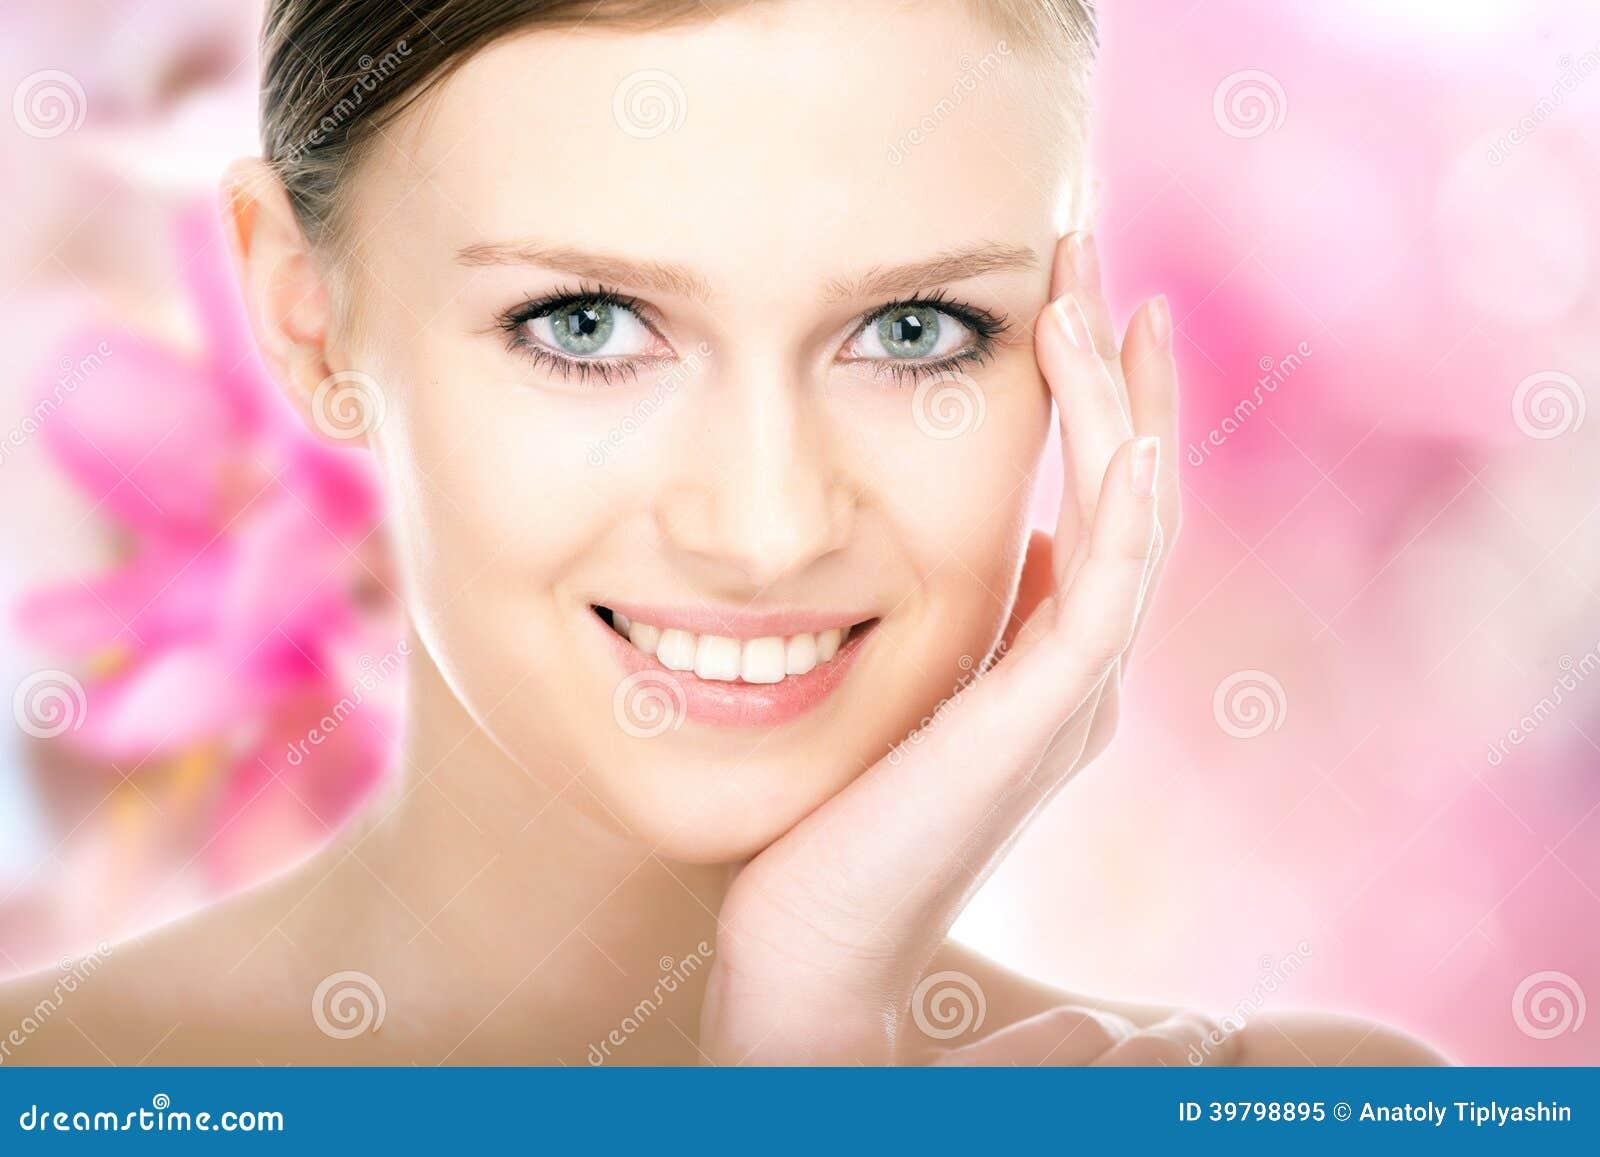 Close-up beauty girl portrait